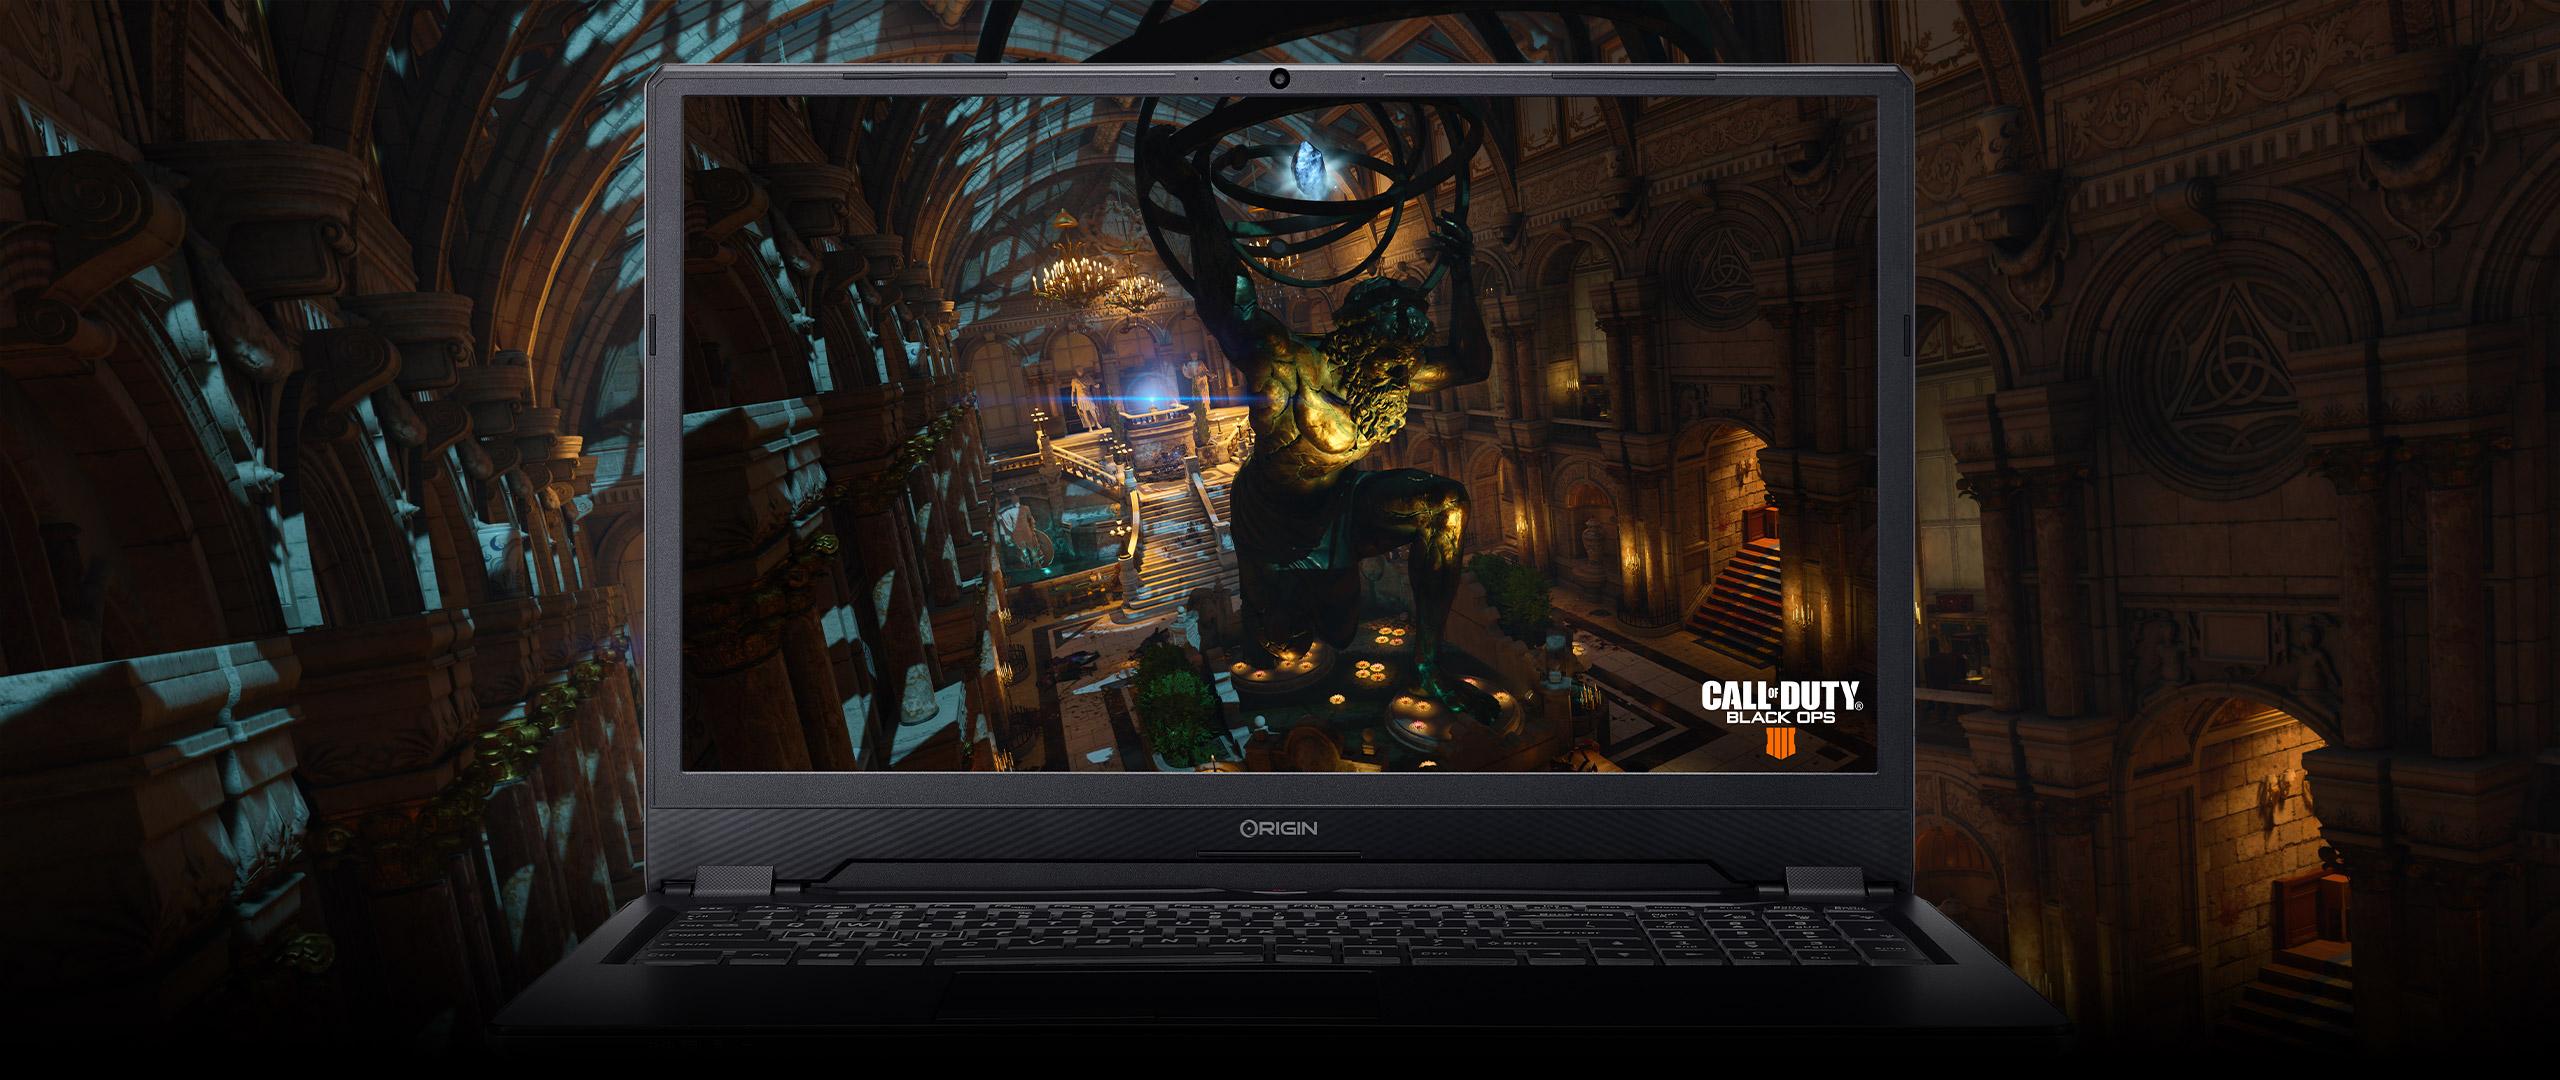 evo16-S custom gaming laptop running Call of Duty: Black Ops 4